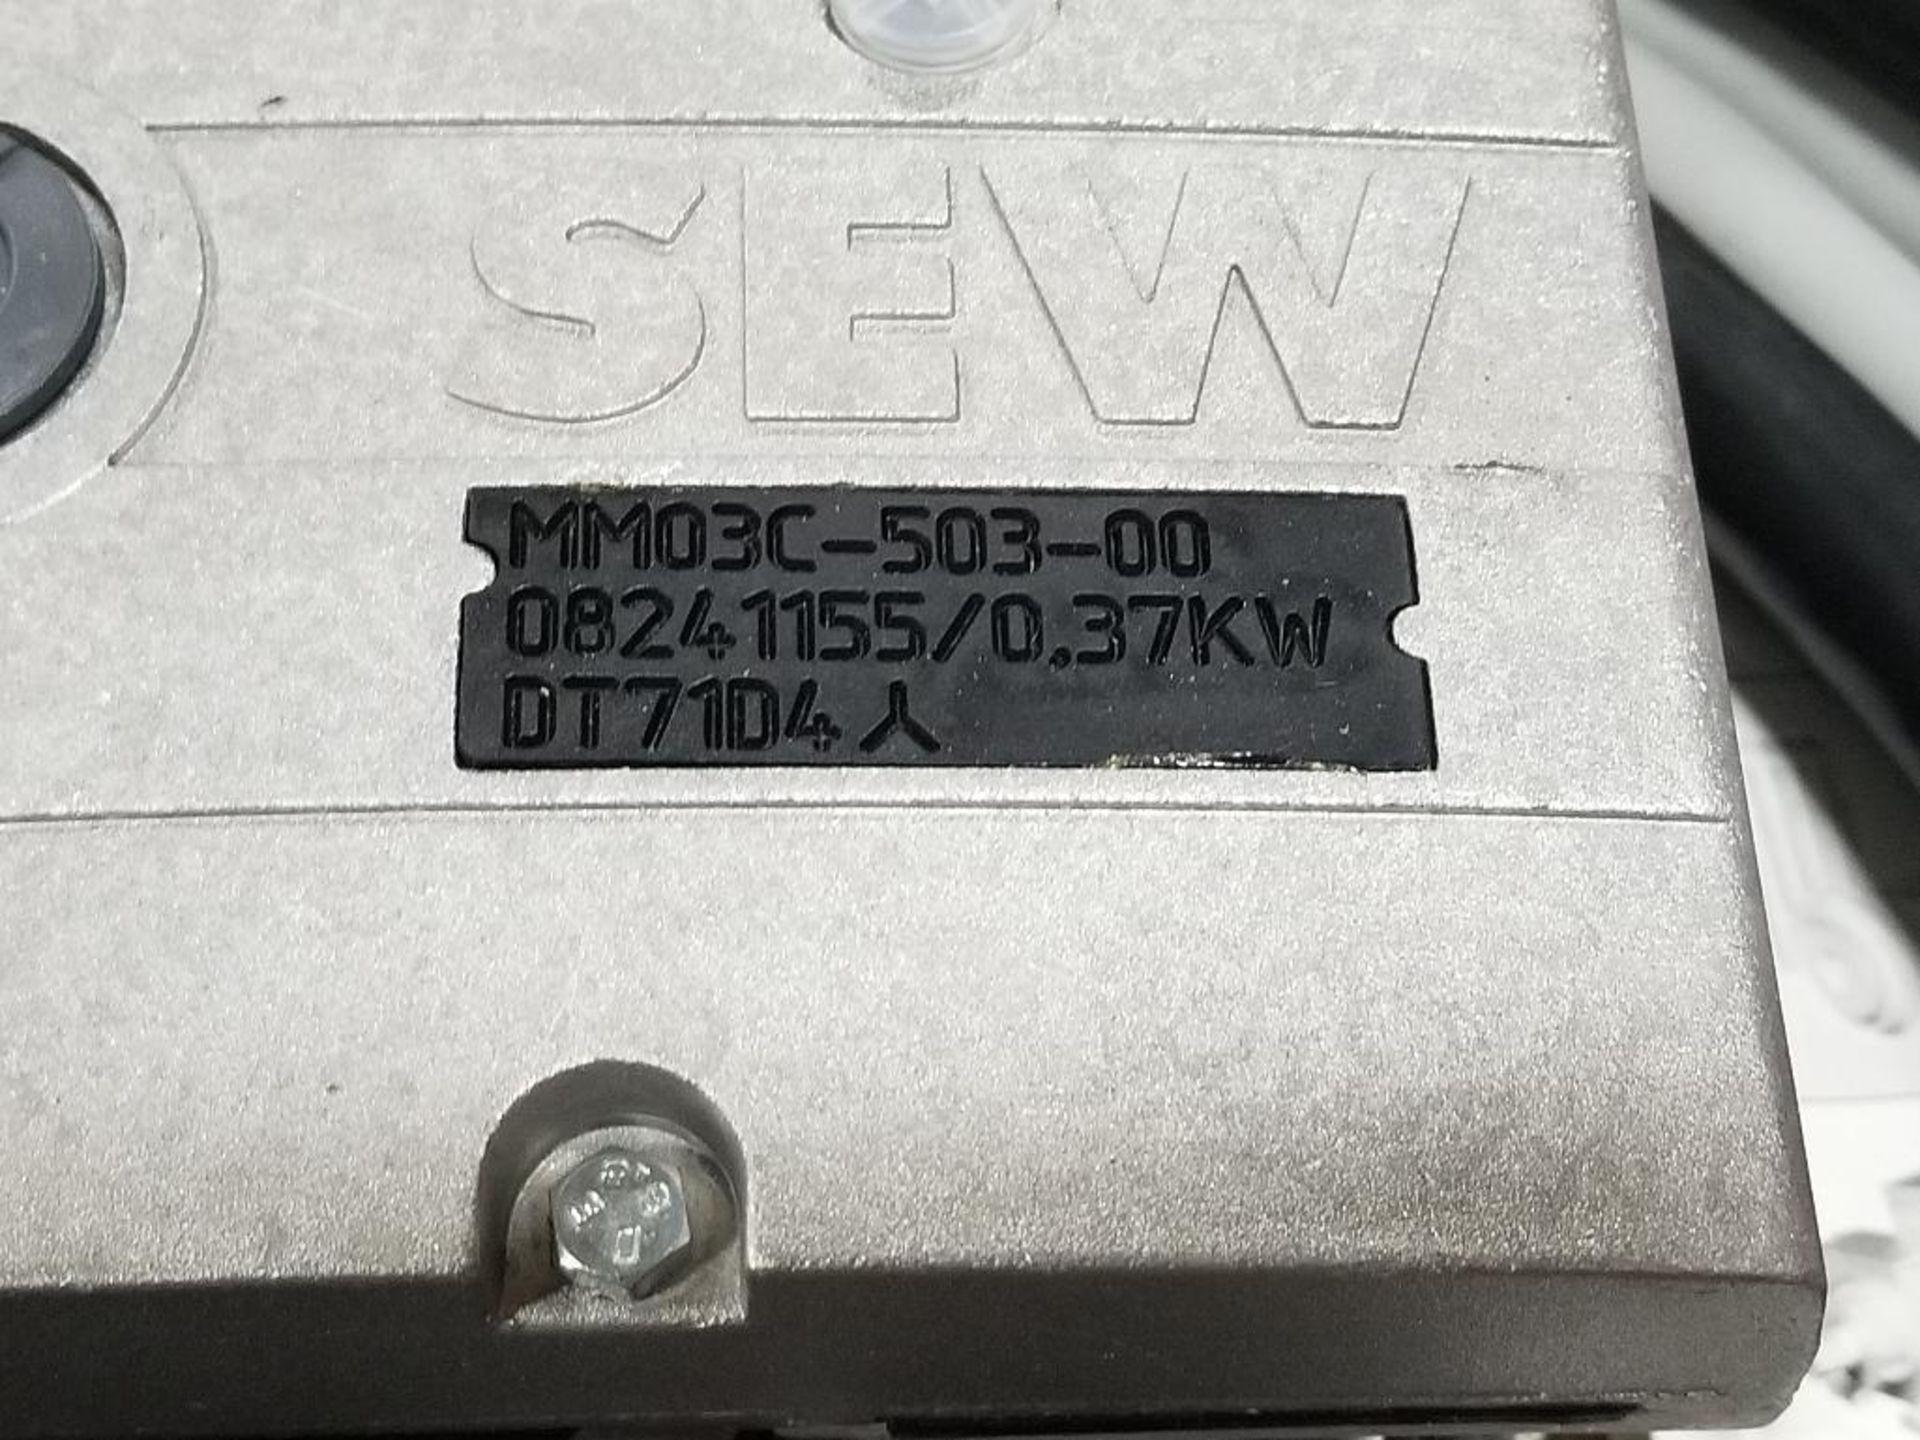 SEW Eurodrive MQD32A/MM03C-503-00/Z238G 0-AGB Drive. - Image 2 of 7